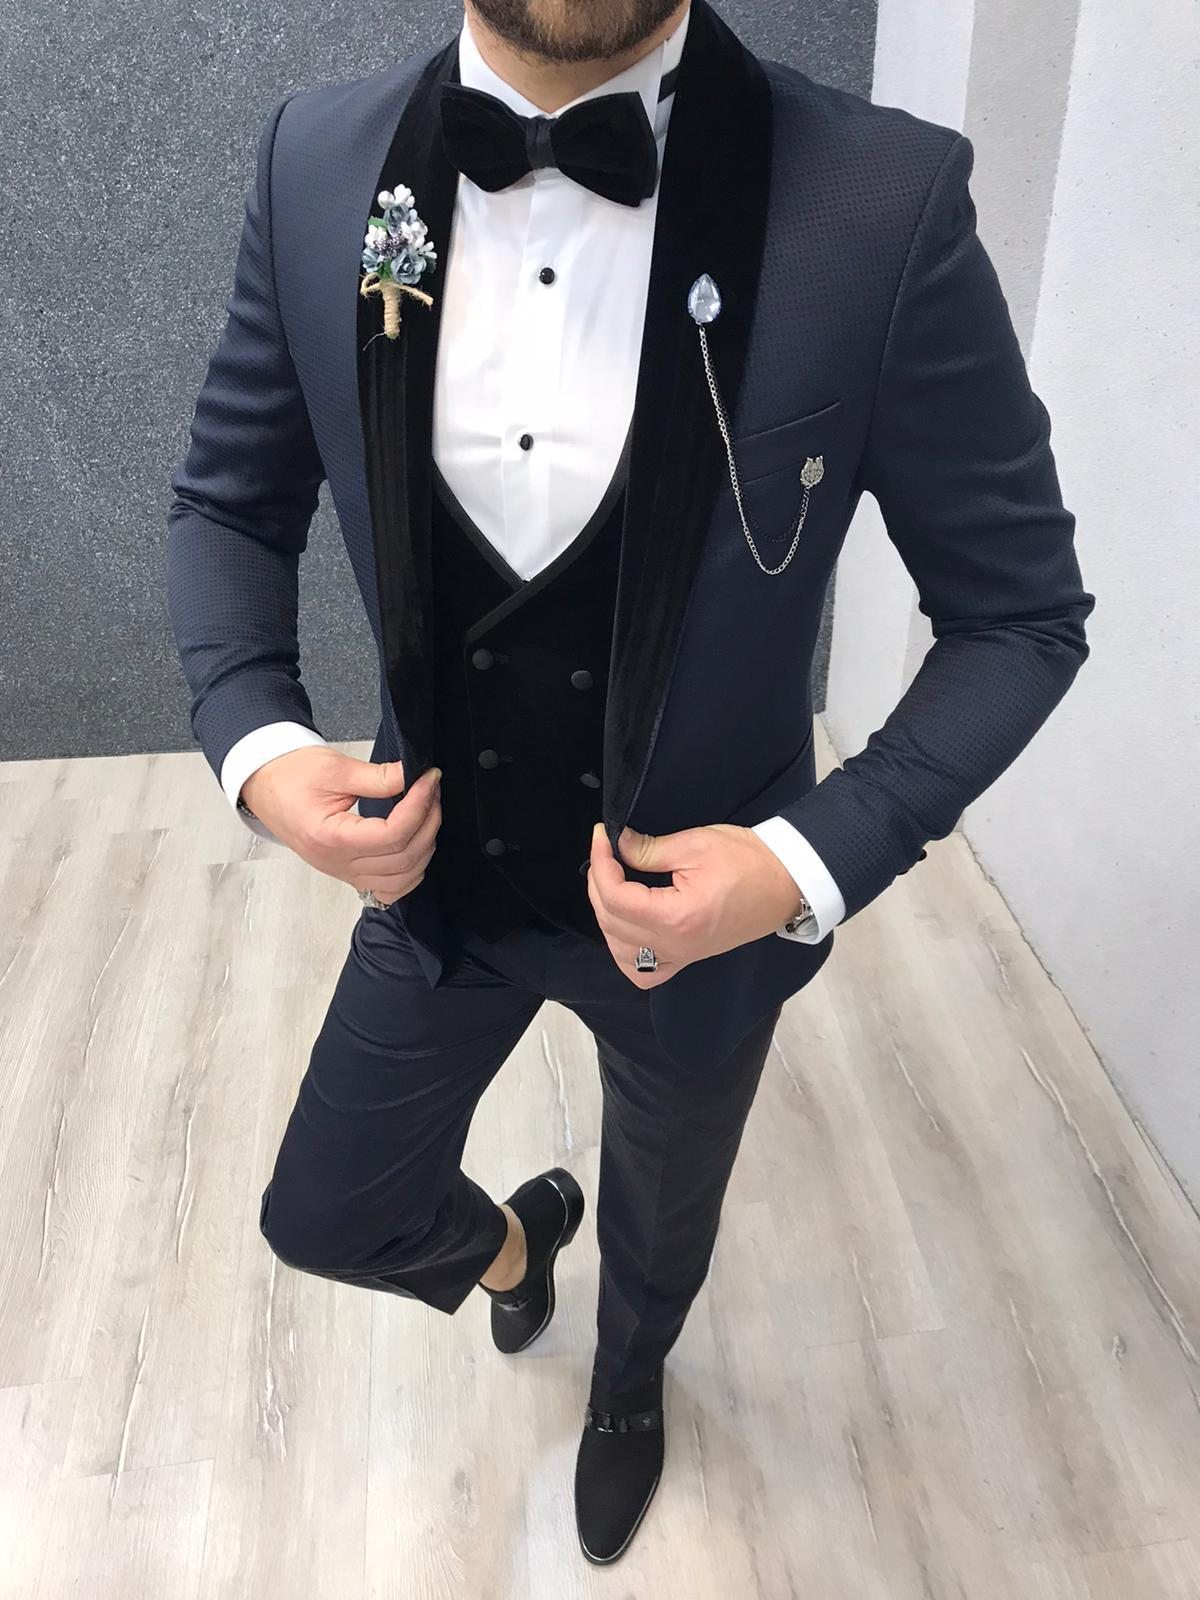 Men Wedding Guest Attire by GentWith.com